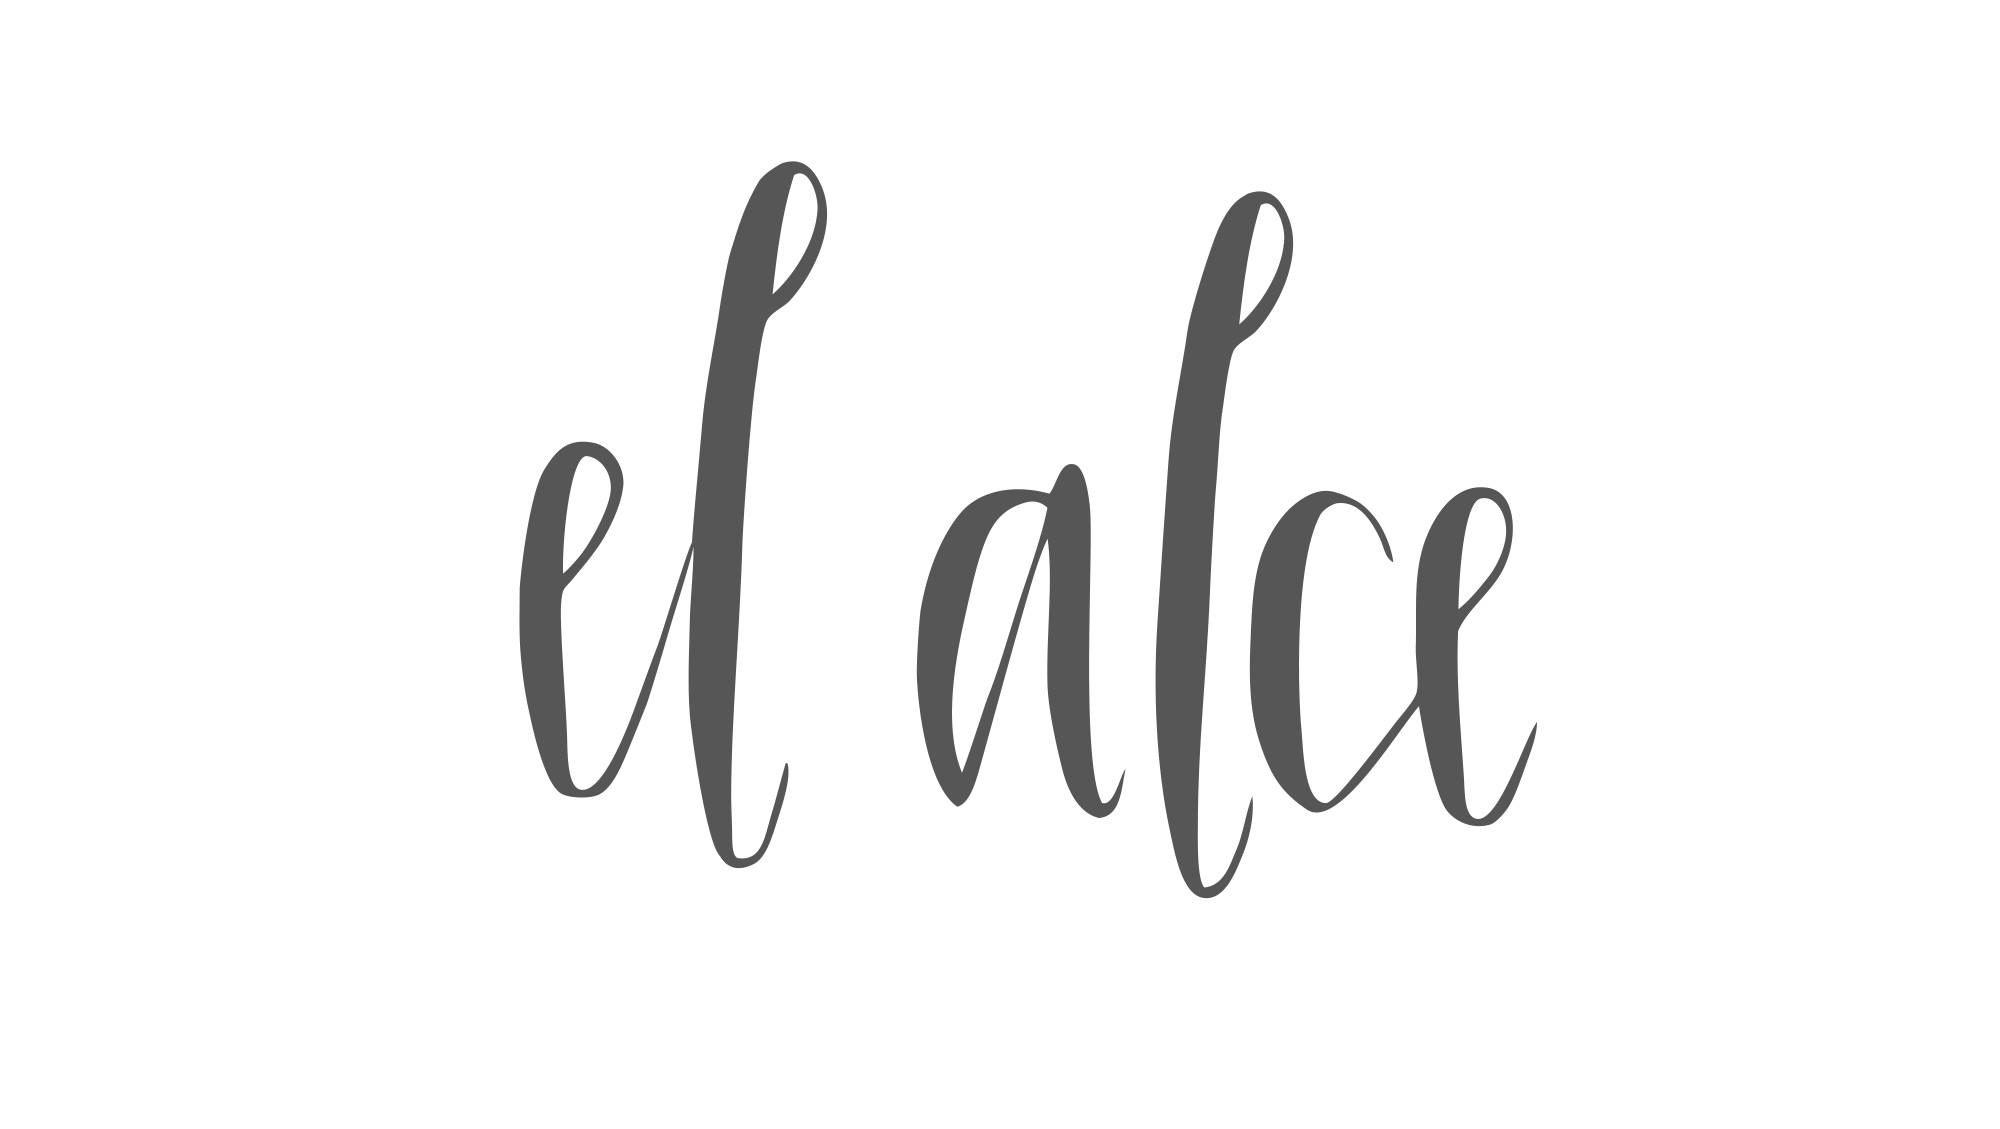 logo-el-alce-diseno-albacete.jpg